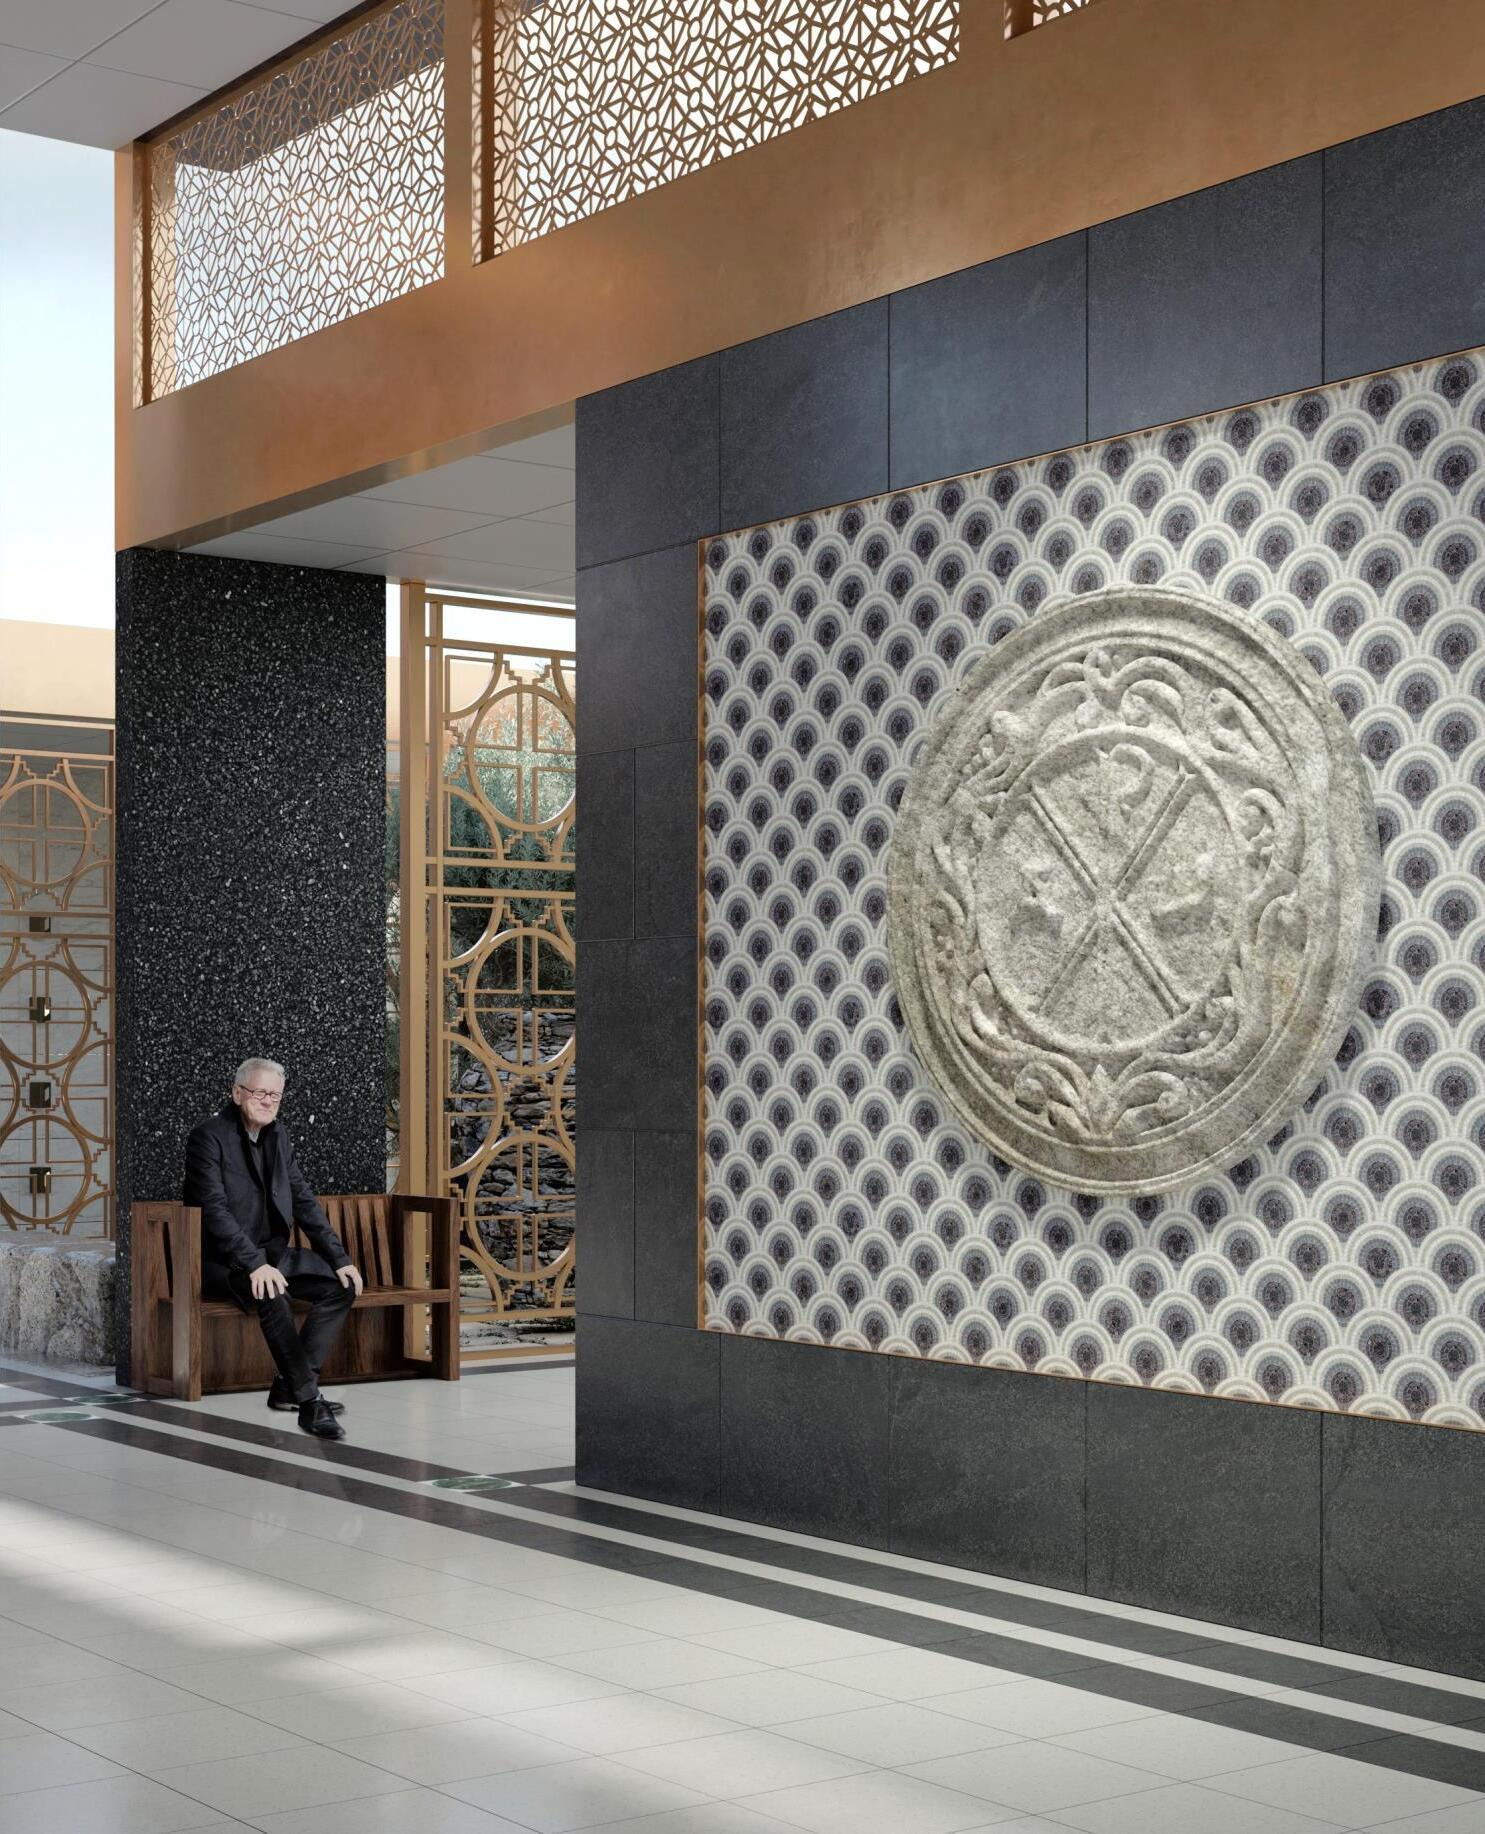 New Mausoleum Expression of Interest